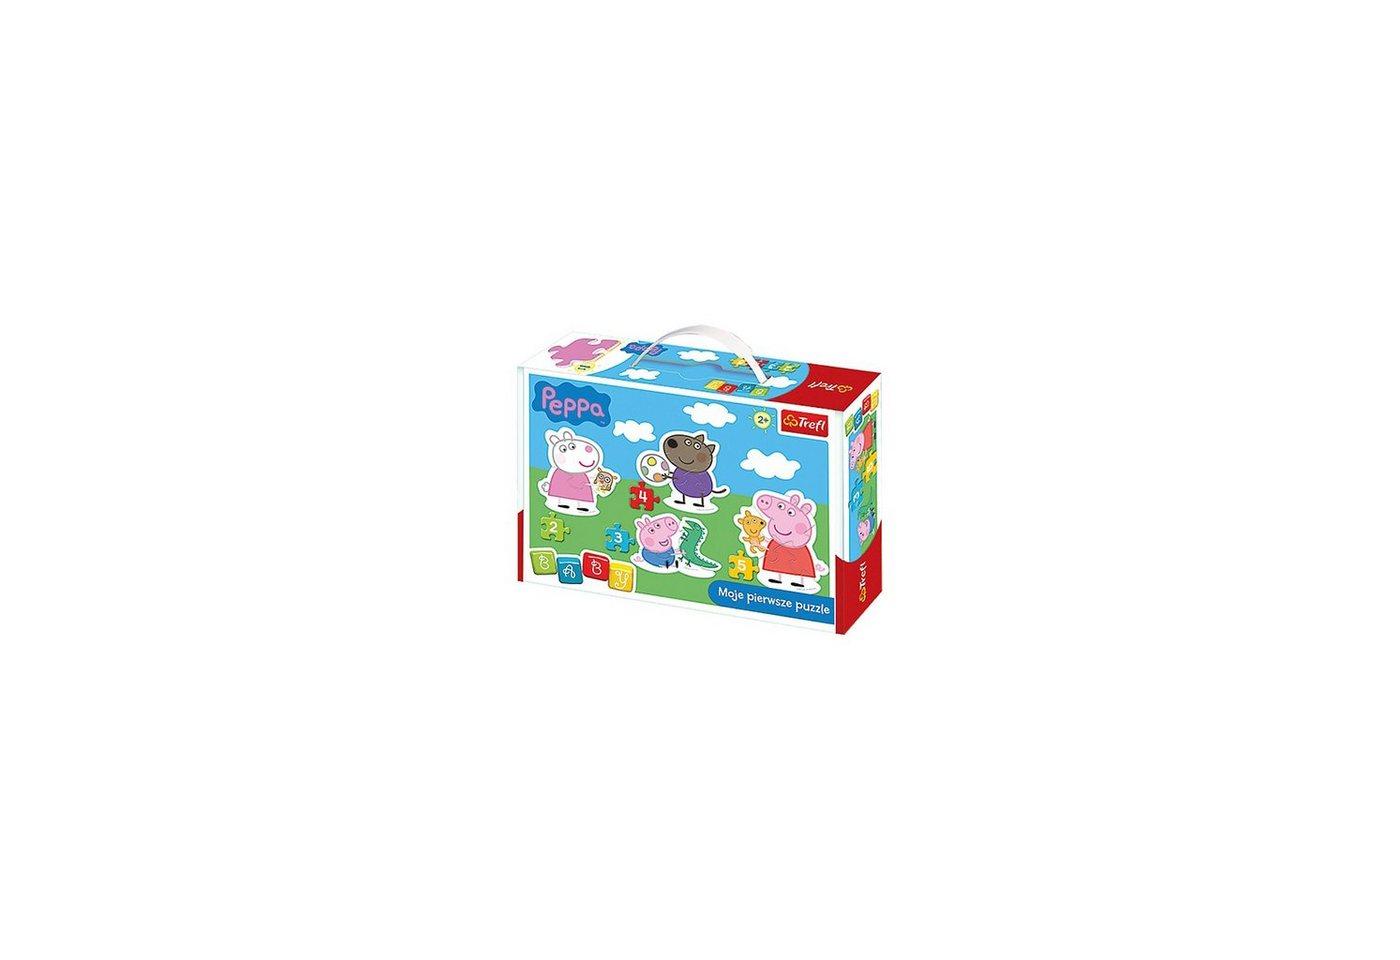 Trefl Baby Puzzle - Peppa Pig - Preisvergleich